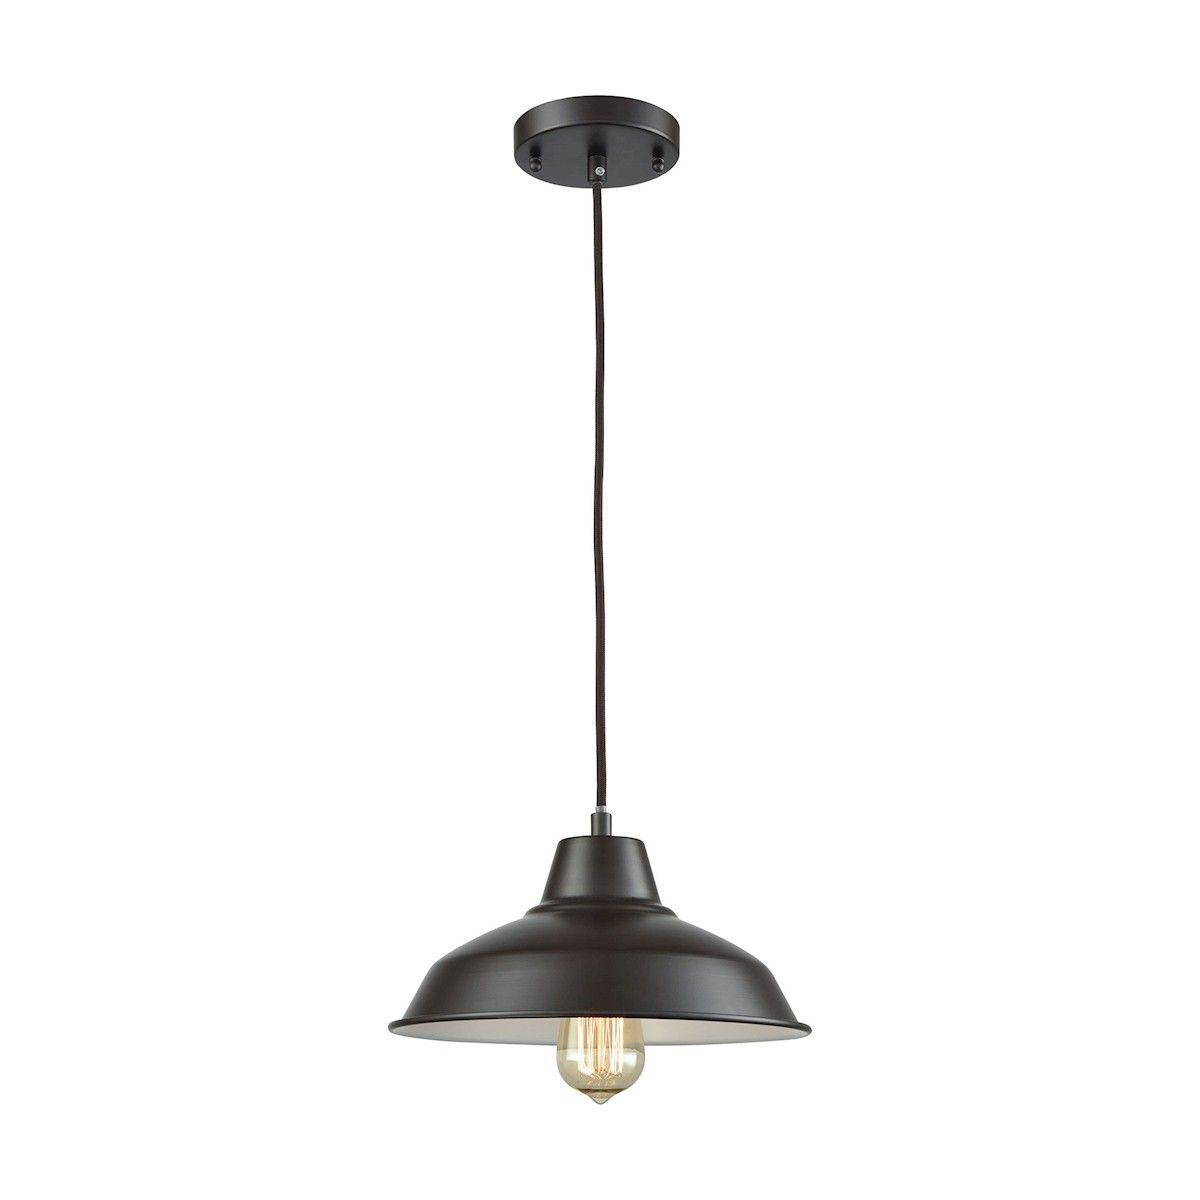 Thomas lighting cn770141 classic loft 1 light pendant in oil rubbed thomas lighting cn770141 classic loft 1 light pendant in oil rubbed bronze arubaitofo Image collections